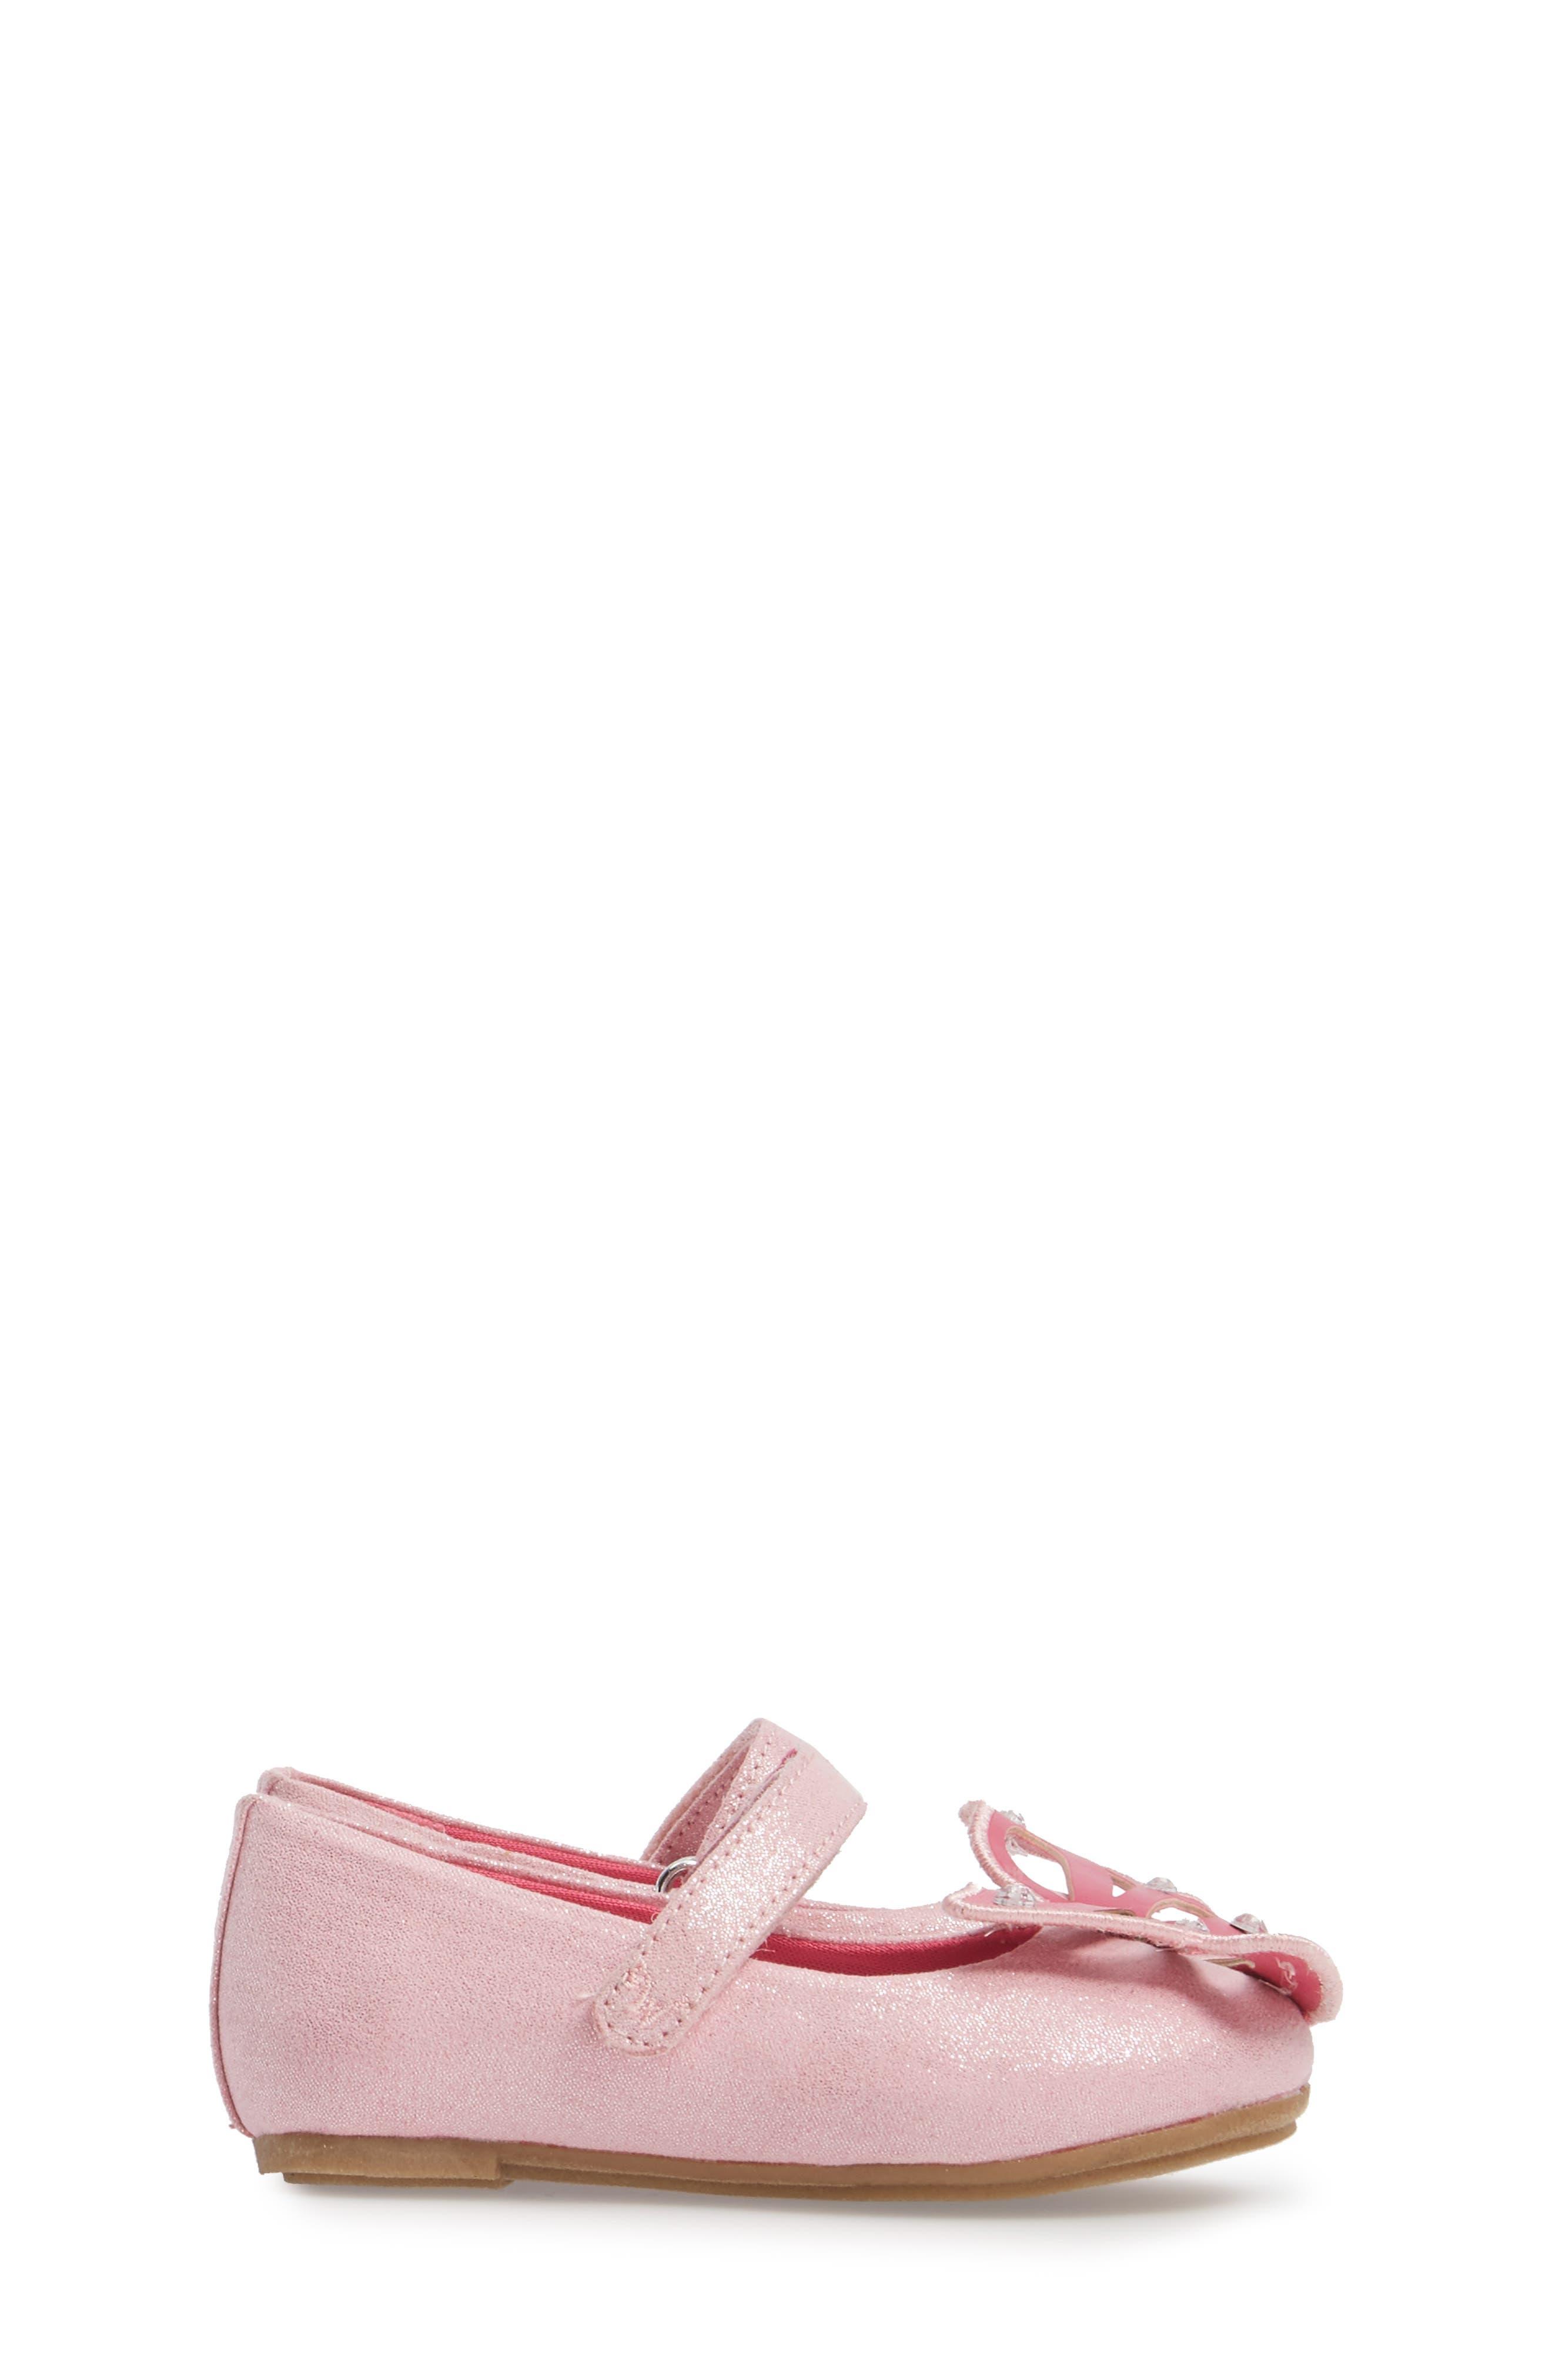 Alternate Image 3  - WellieWishers from American Girl Flutter Wings Embellished Ballet Flat (Walker & Toddler)